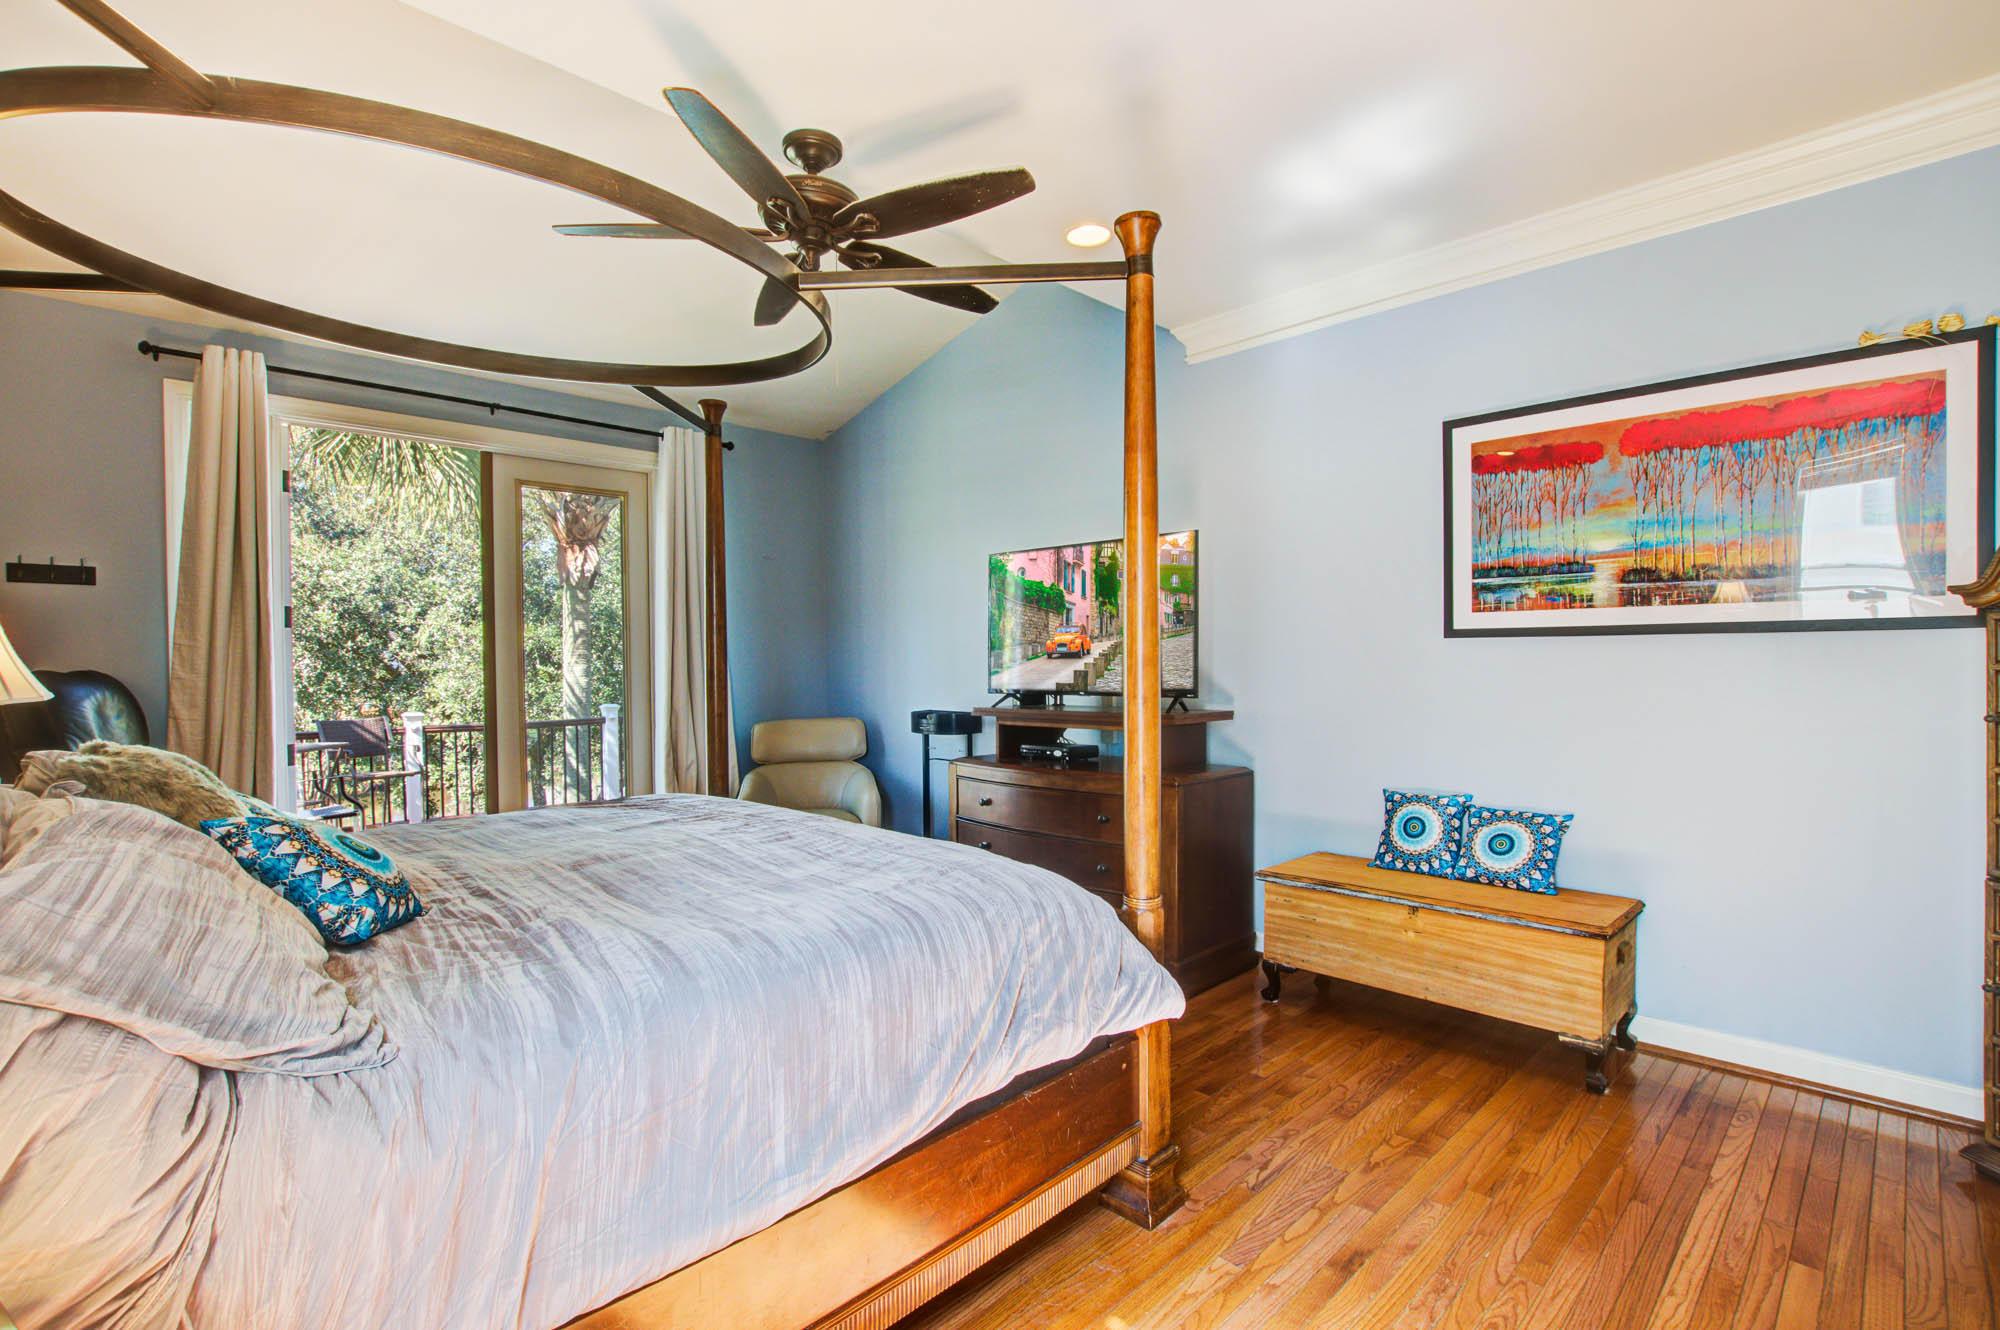 St Thomas Point Homes For Sale - 307 Jamesbury, Charleston, SC - 22